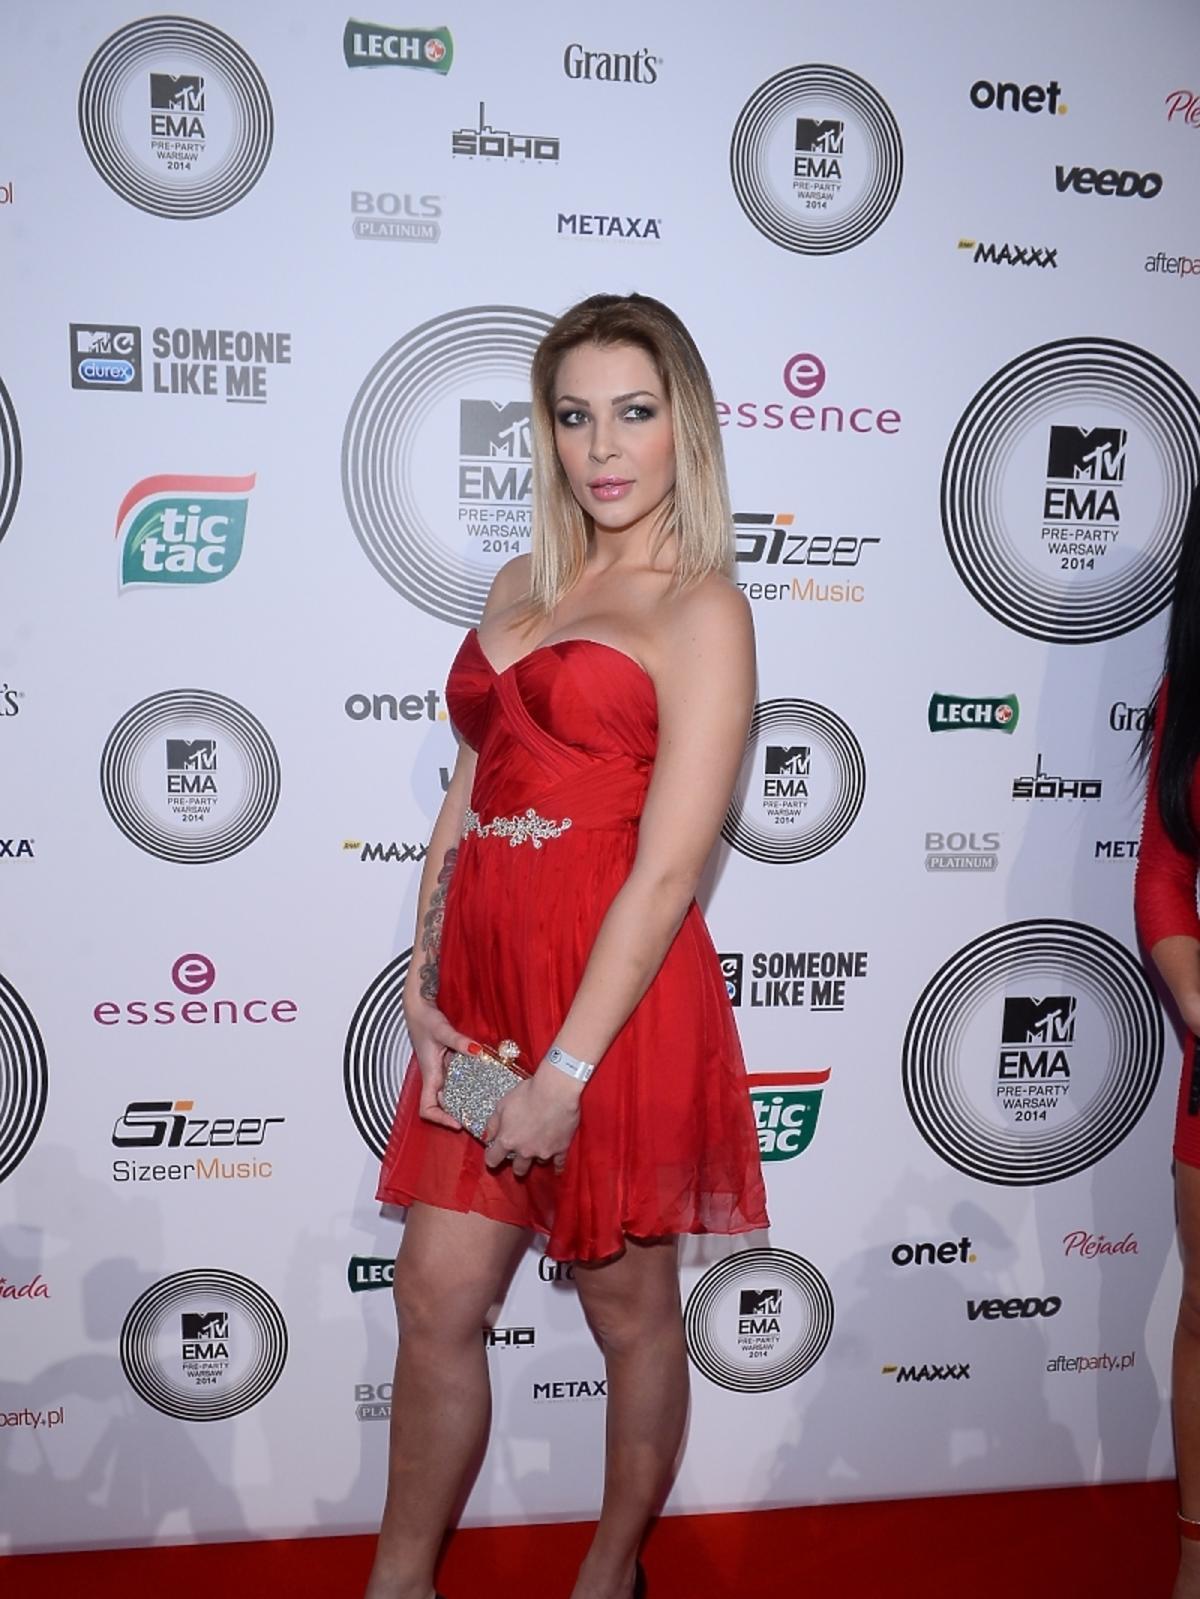 Ania z Warsaw Shore na MTV EMA Pre-Party 2014